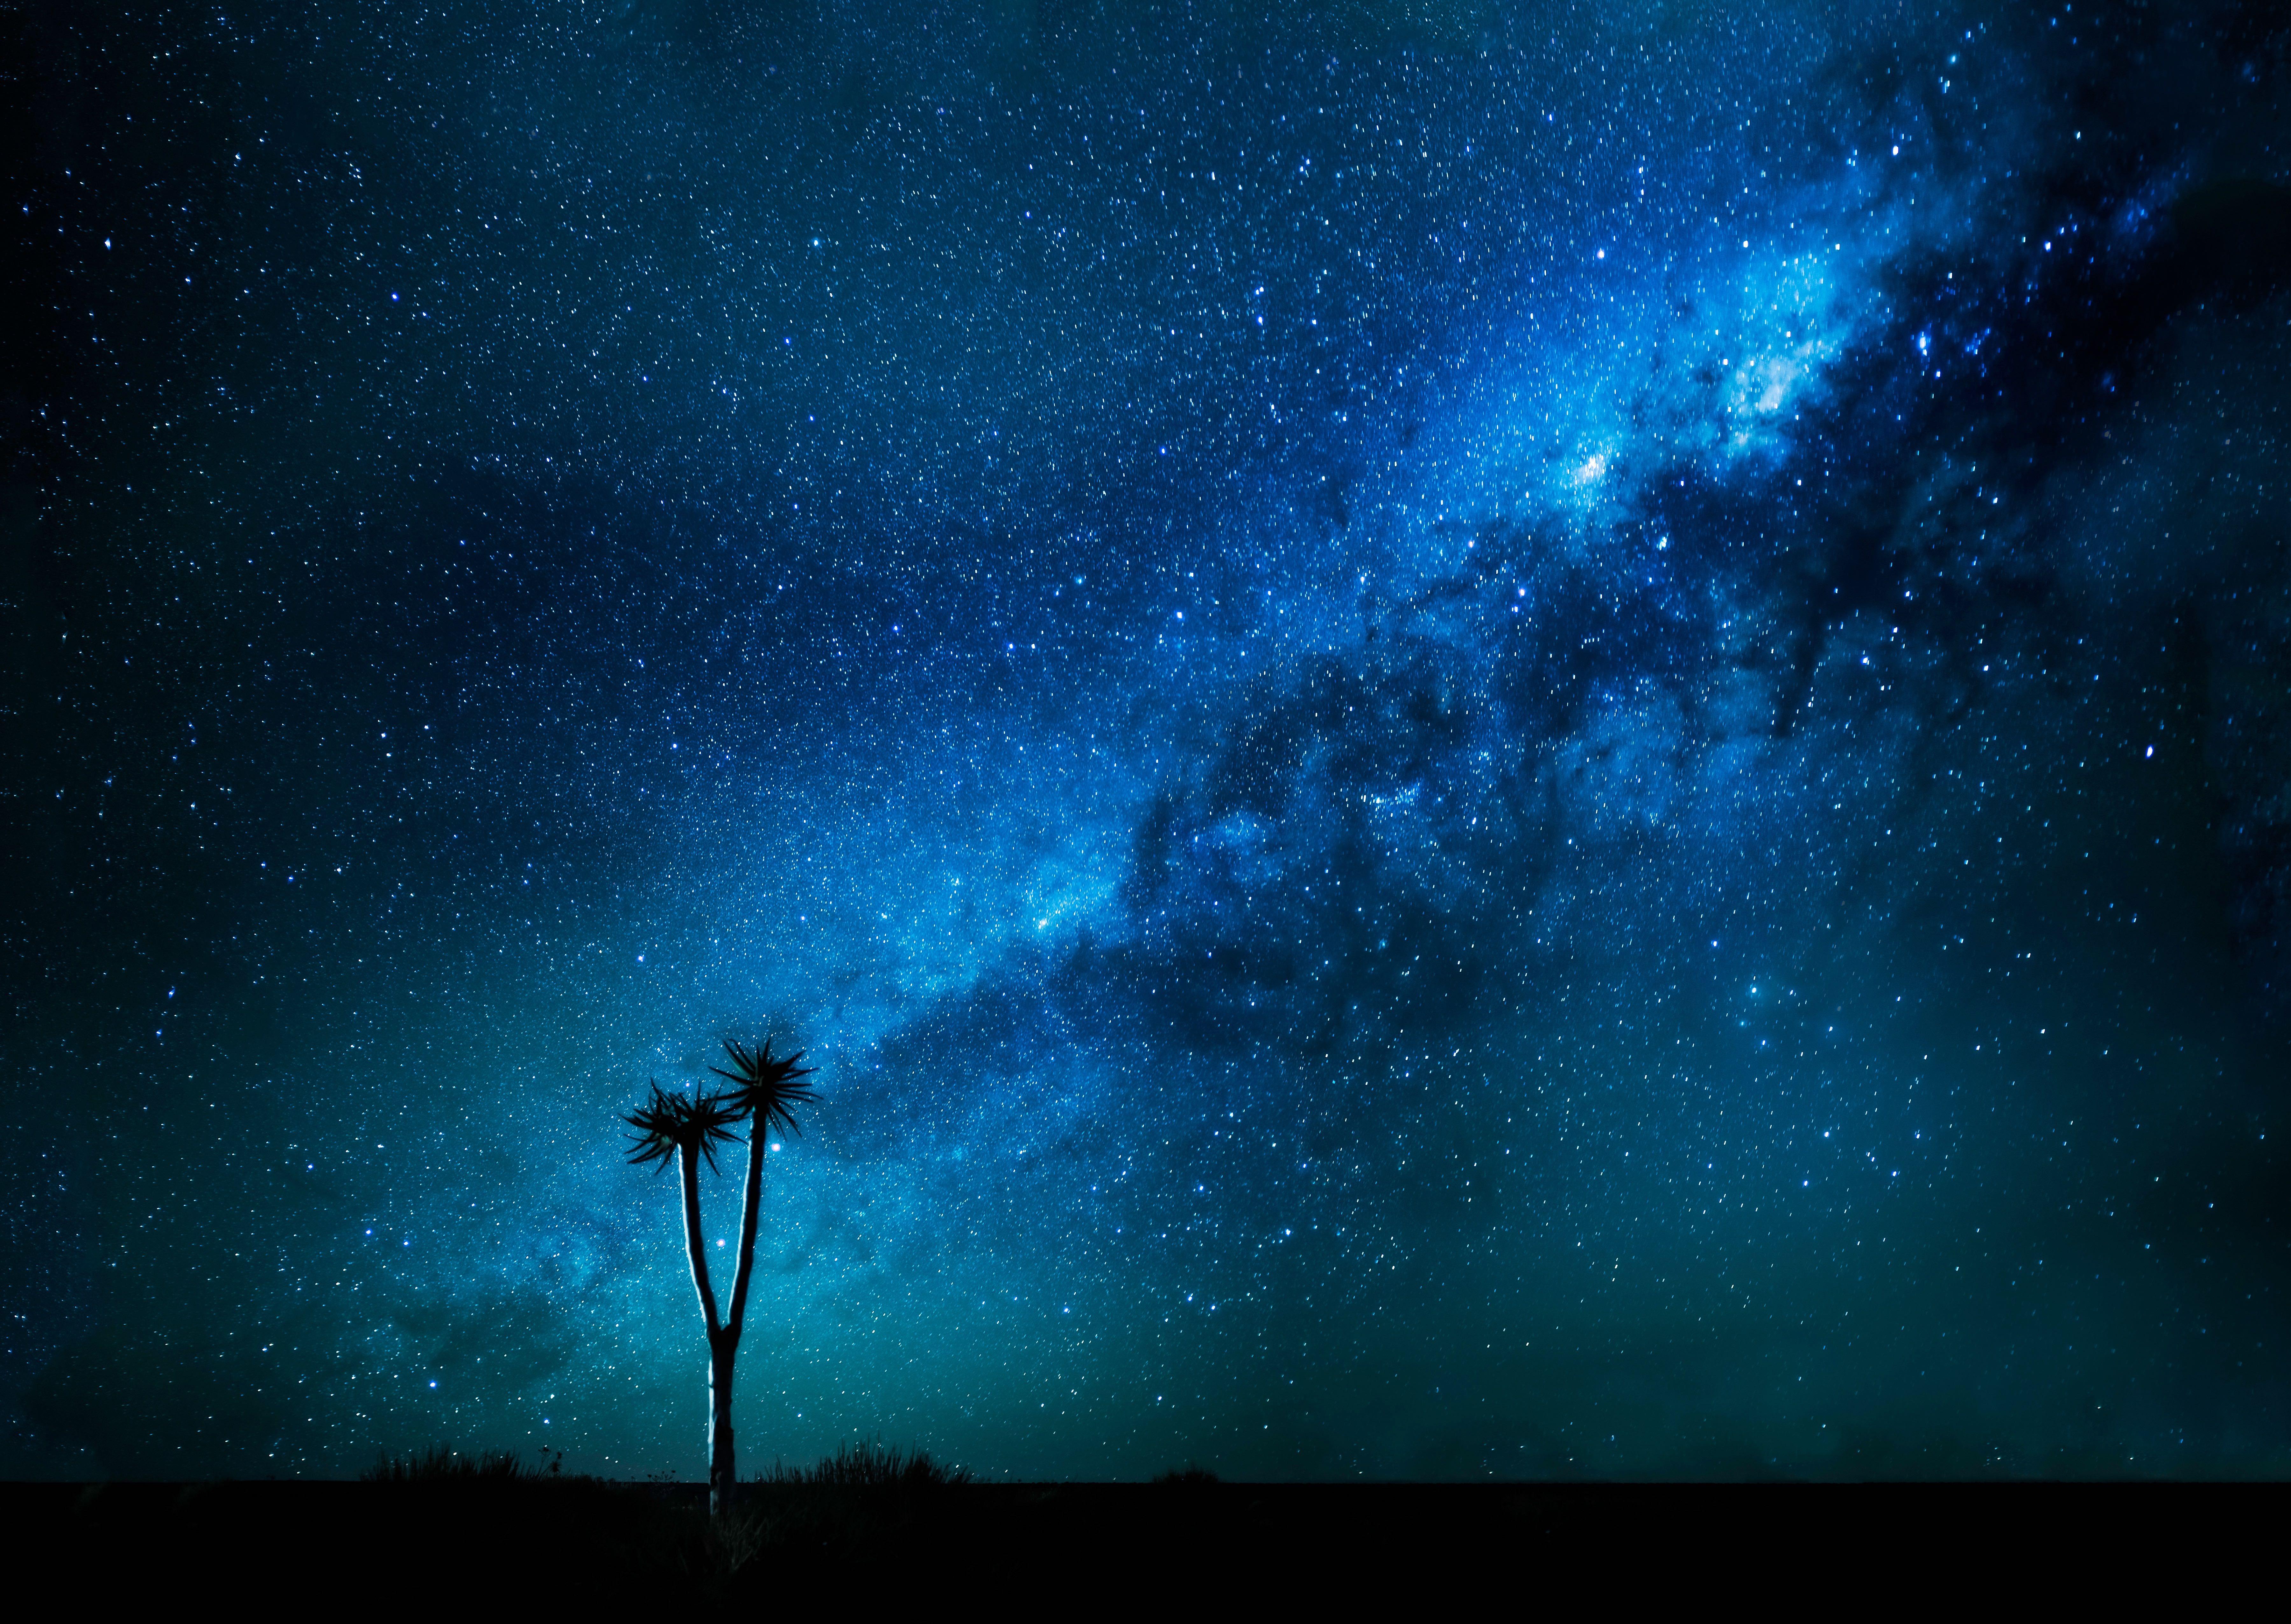 Milkyway 8k hd digital universe 4k wallpapers images - Wallpaper iphone 8k ...